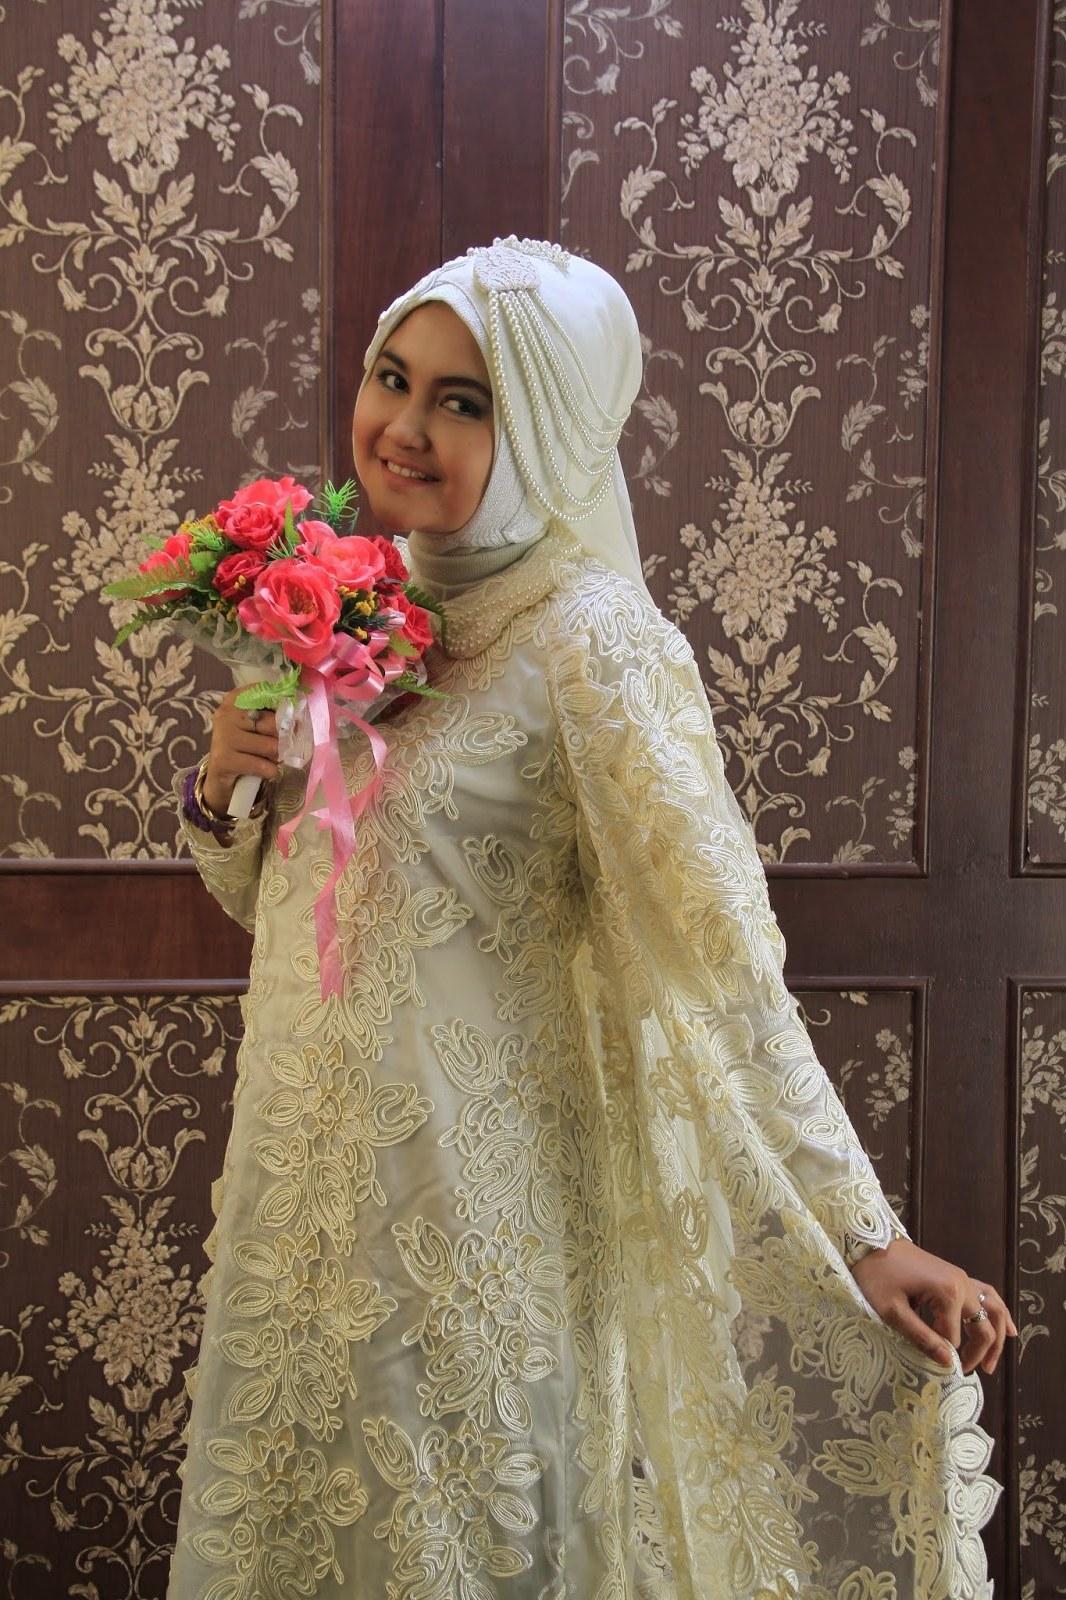 Design Gaun Pengantin 2016 Muslim Etdg Padme Wedding Dress Confessions Of A Seamstress the